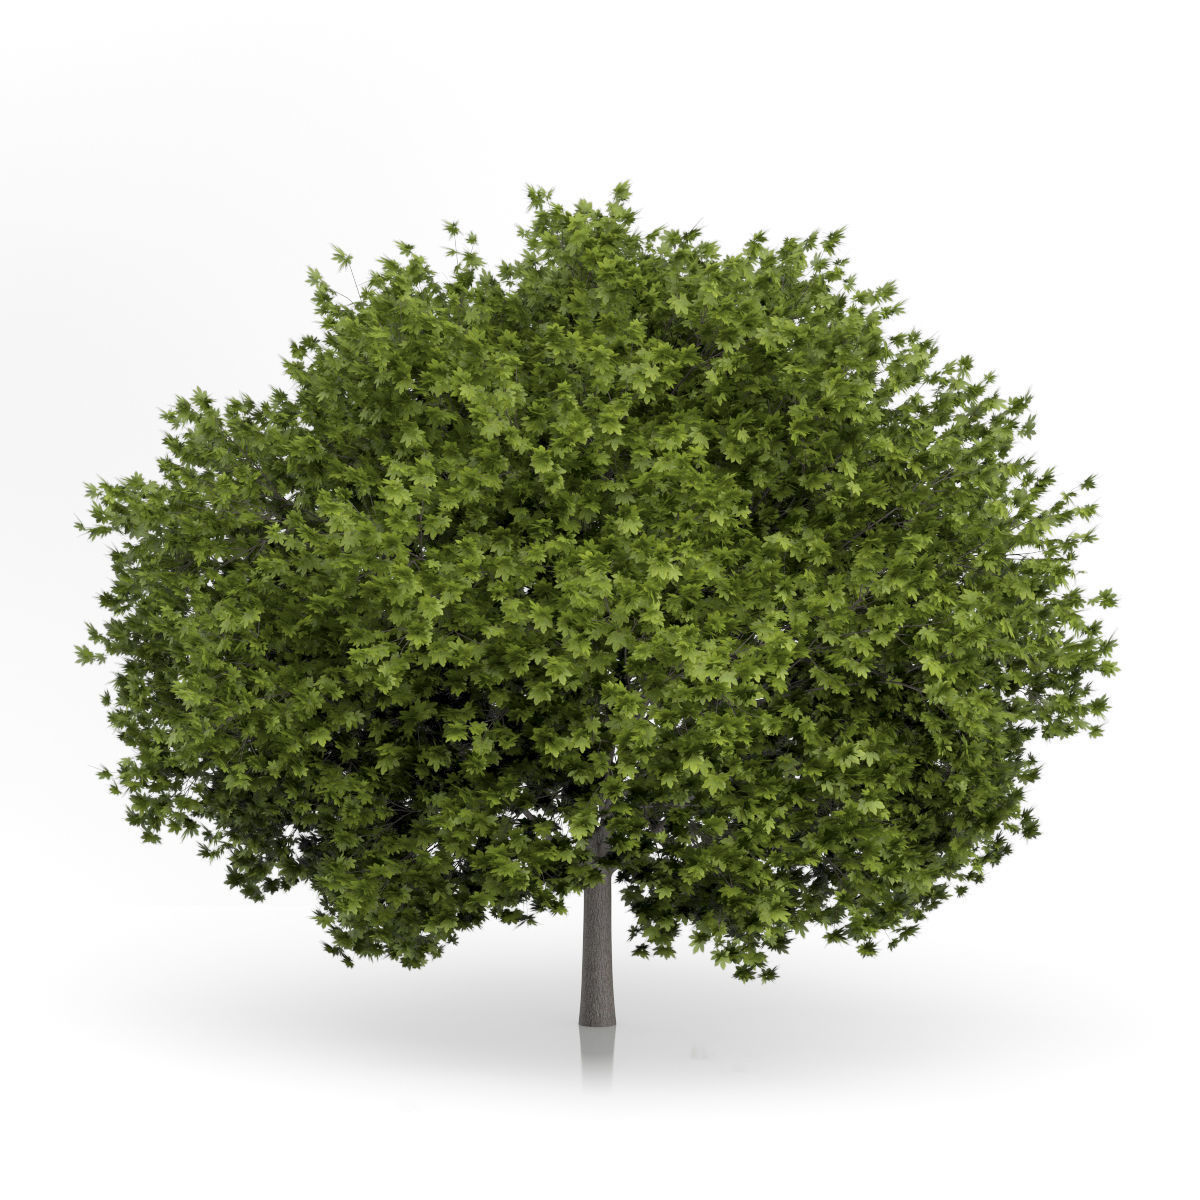 Norway Maple Tree Acer platanoides